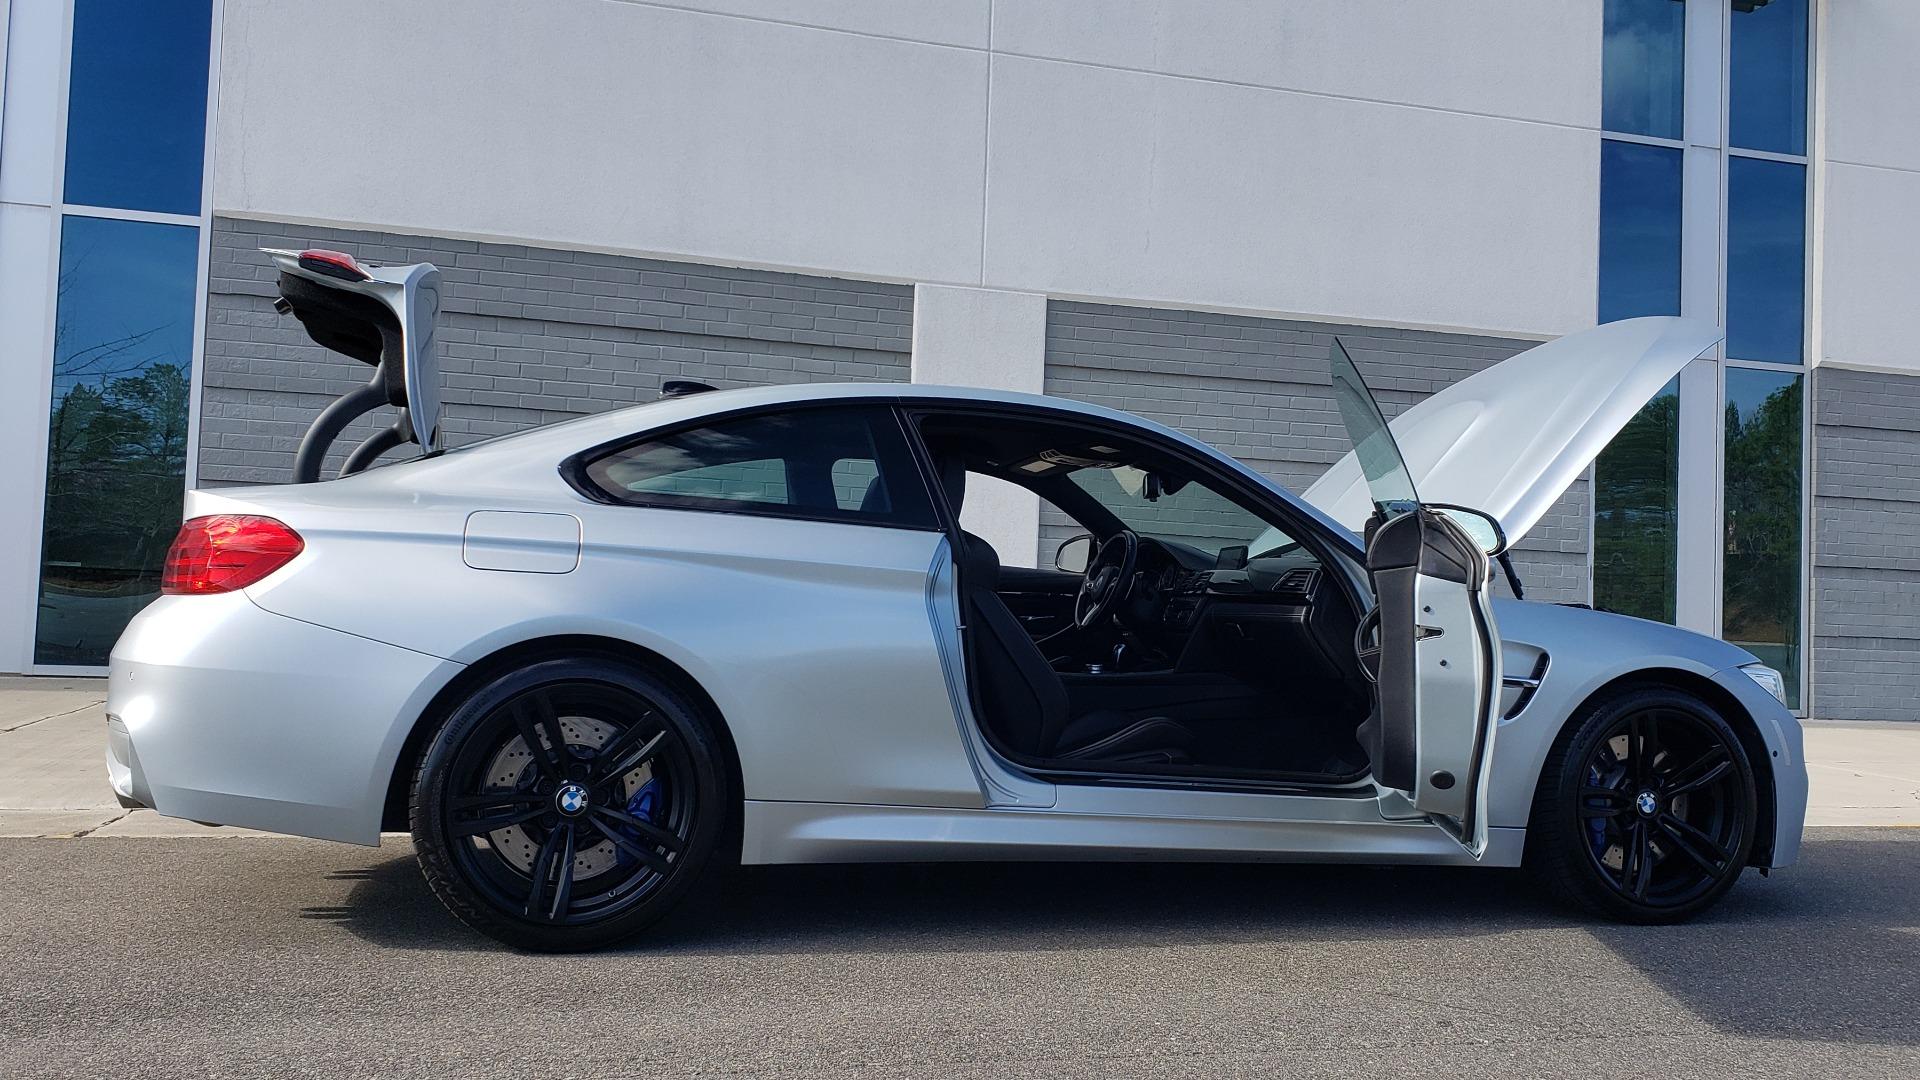 Used 2015 BMW M4 COUPE / EXEC PKG / DRVR ASST PLUS / LIGHTING / M-SUSPENSION for sale Sold at Formula Imports in Charlotte NC 28227 12